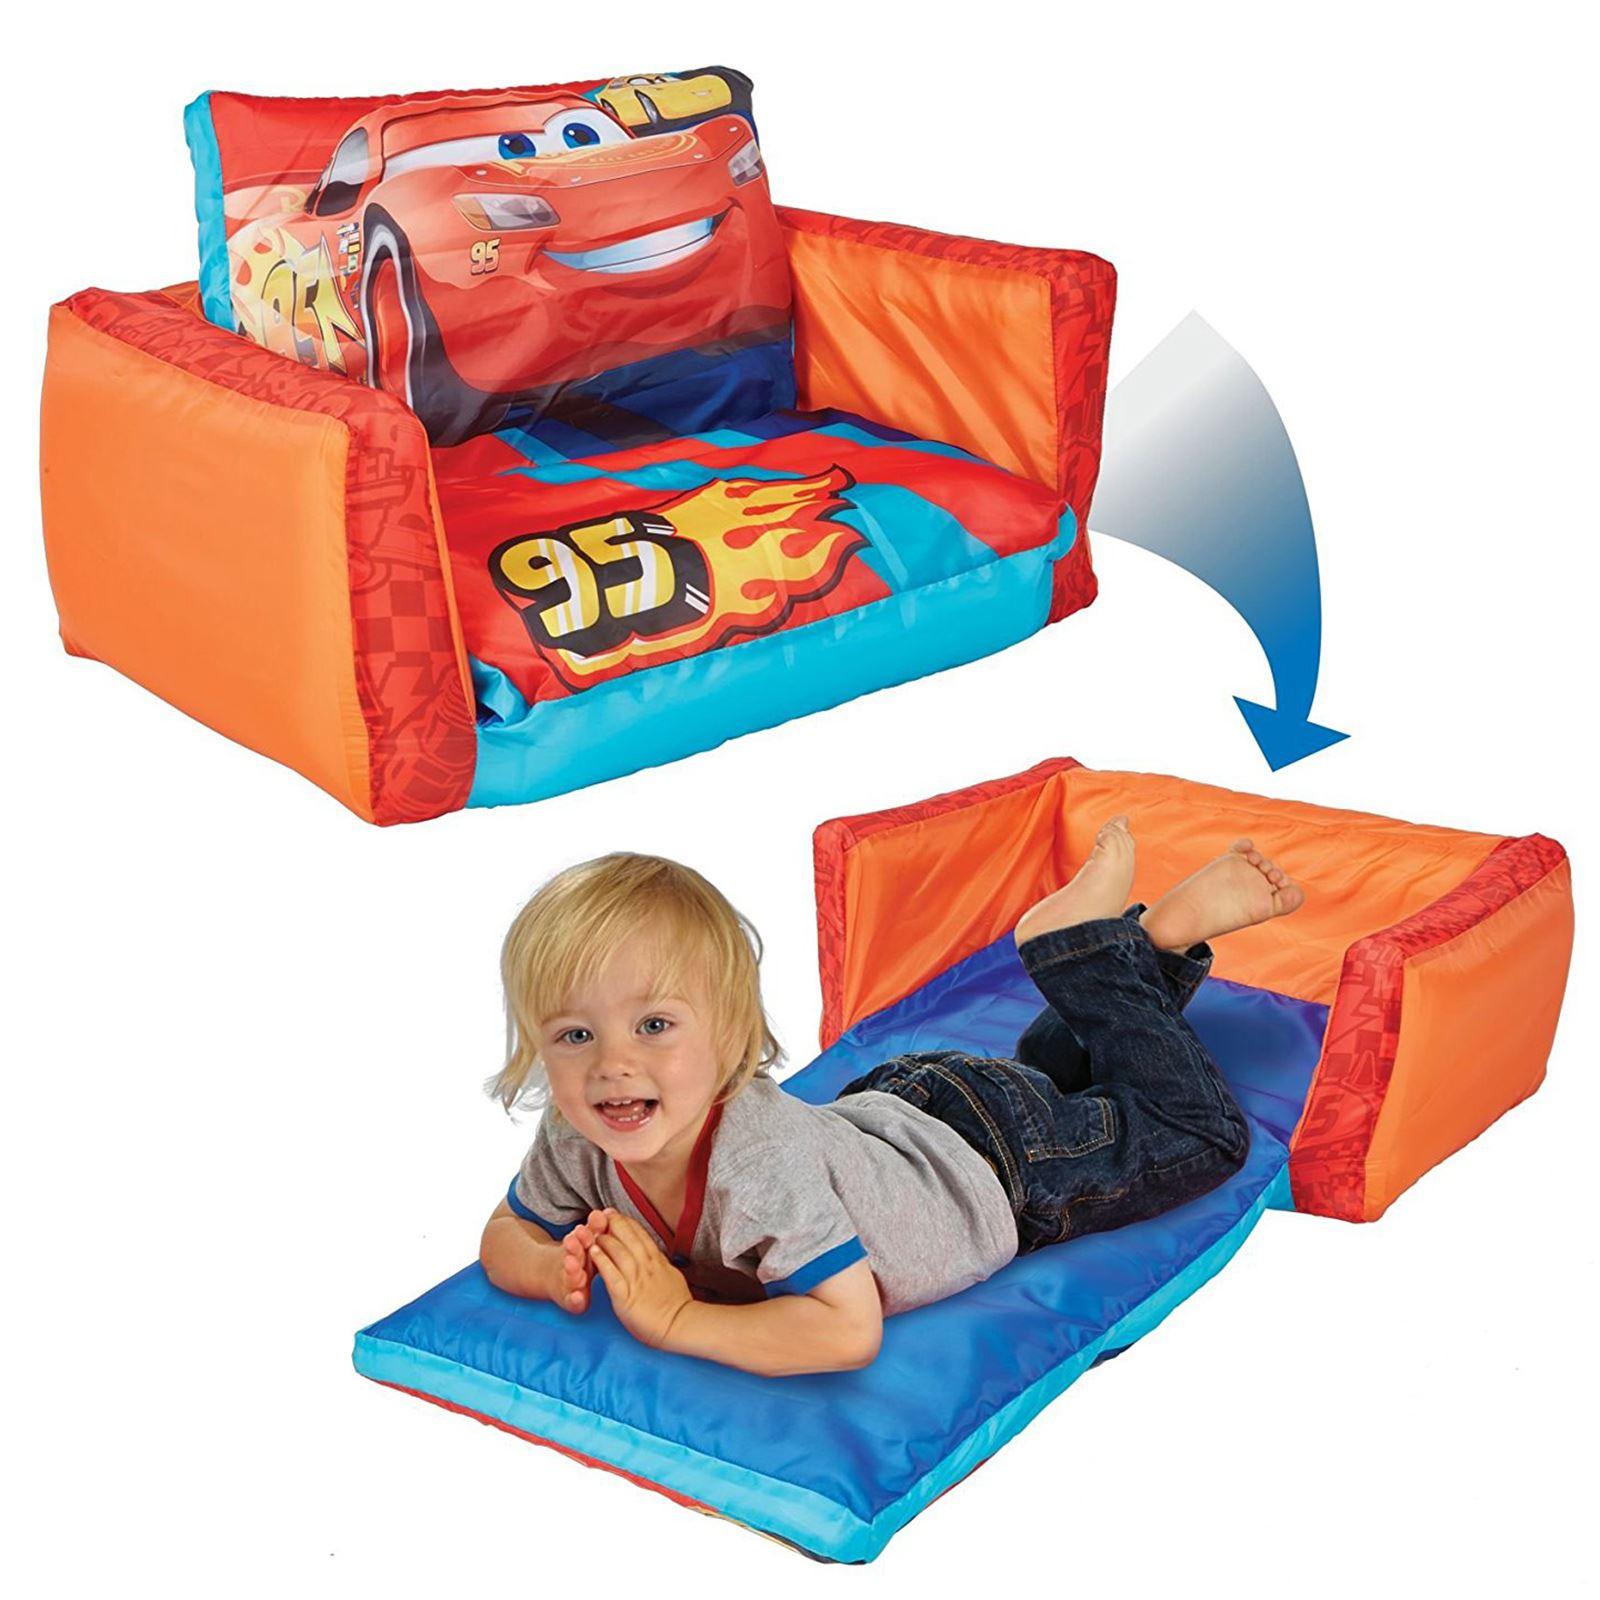 disney cars flip out sofa australia sets for sale range inflatable kids room new minions